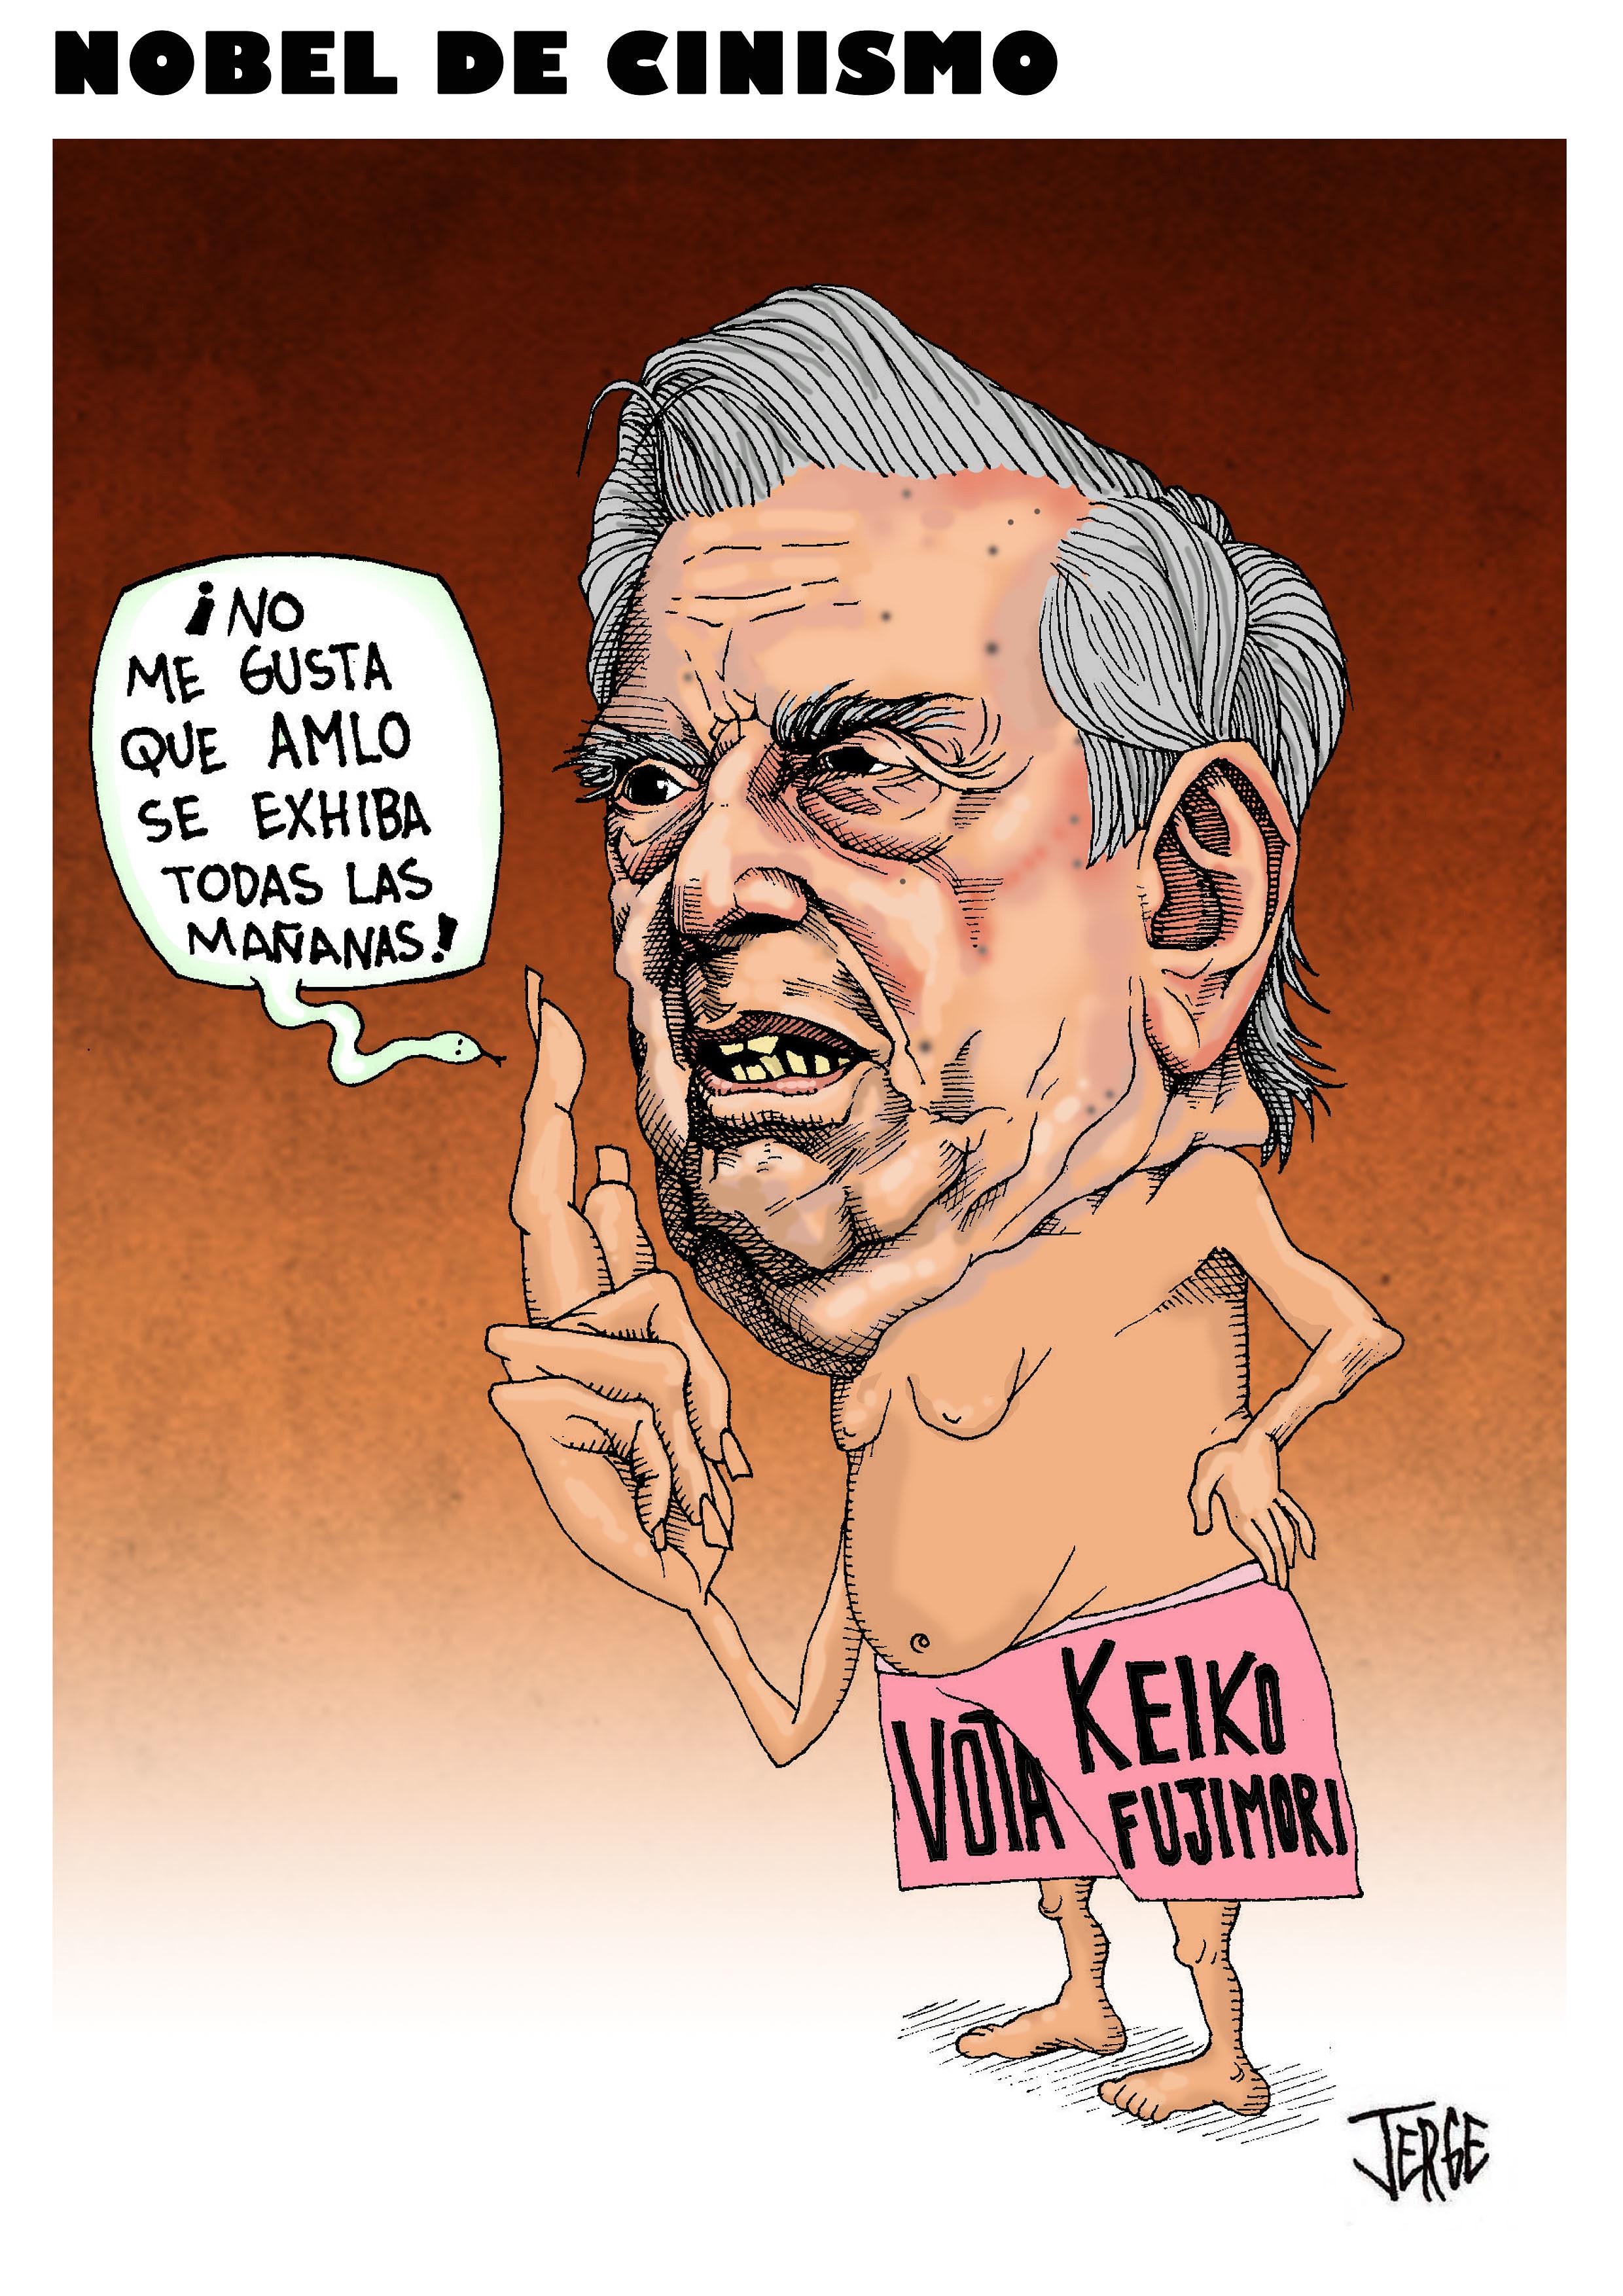 Nobel del cinismo